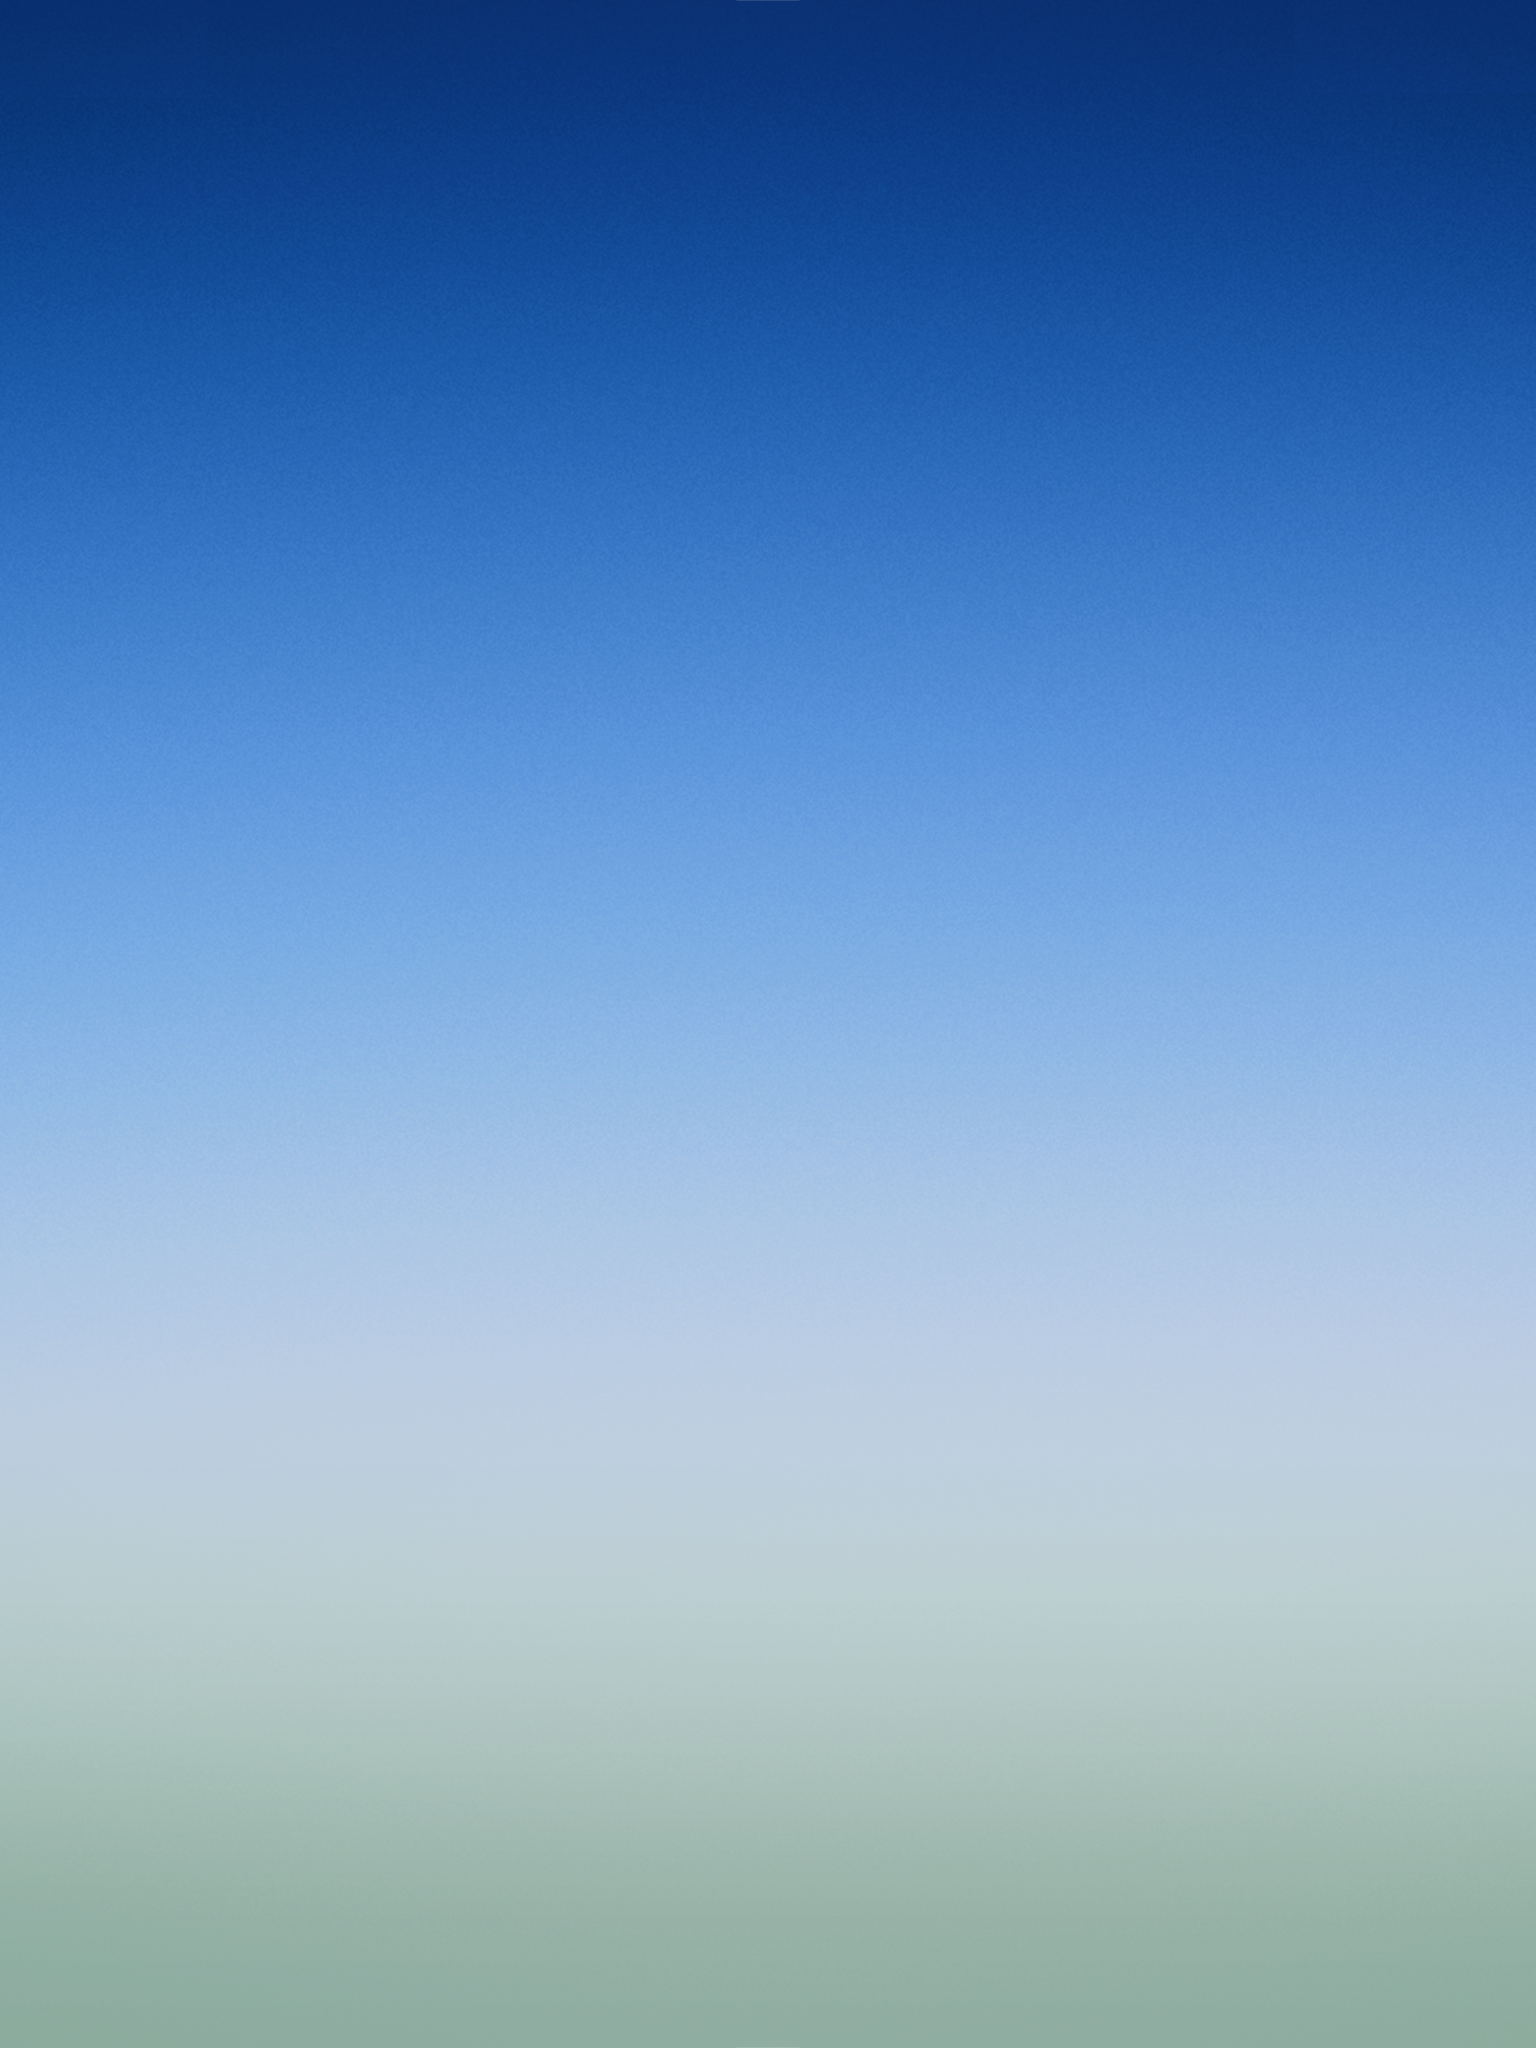 iPad Air - Wallpaper - Original